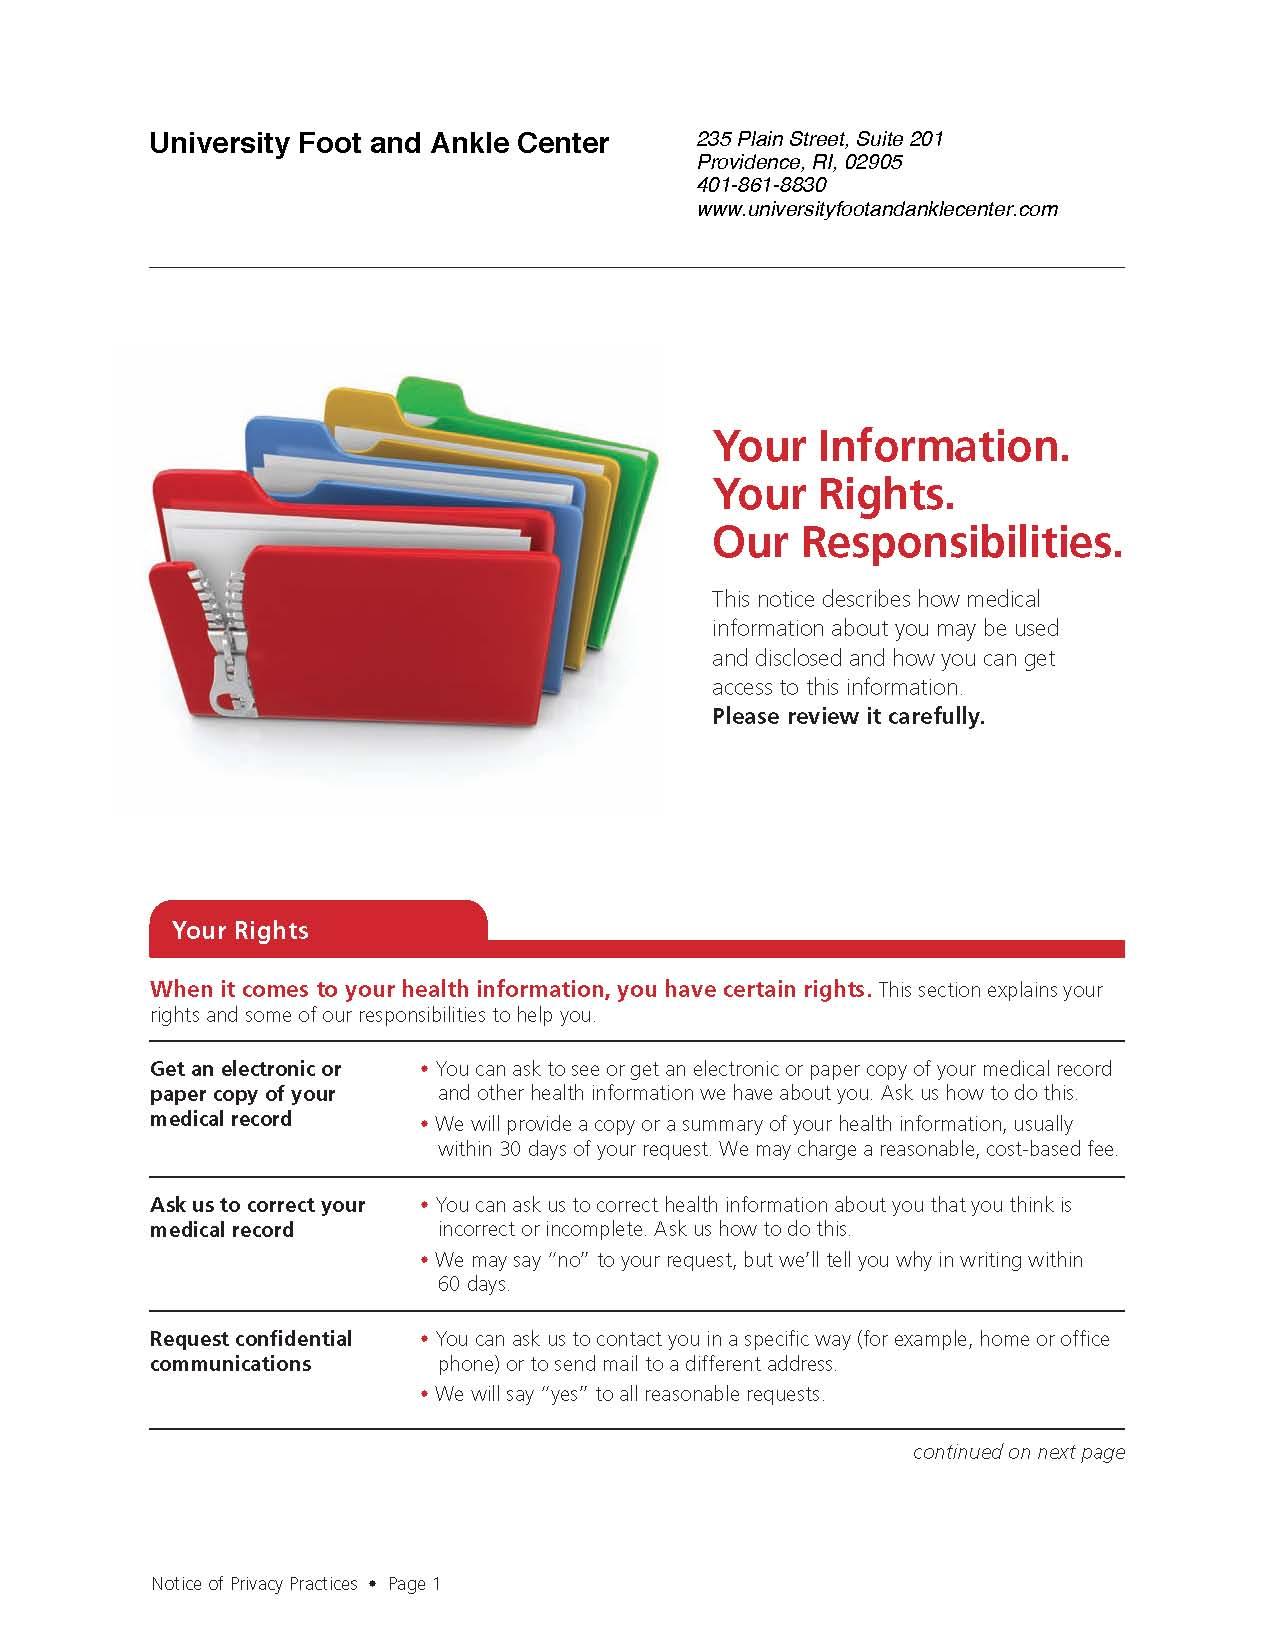 UFAAC HIPAA Doc pg 1